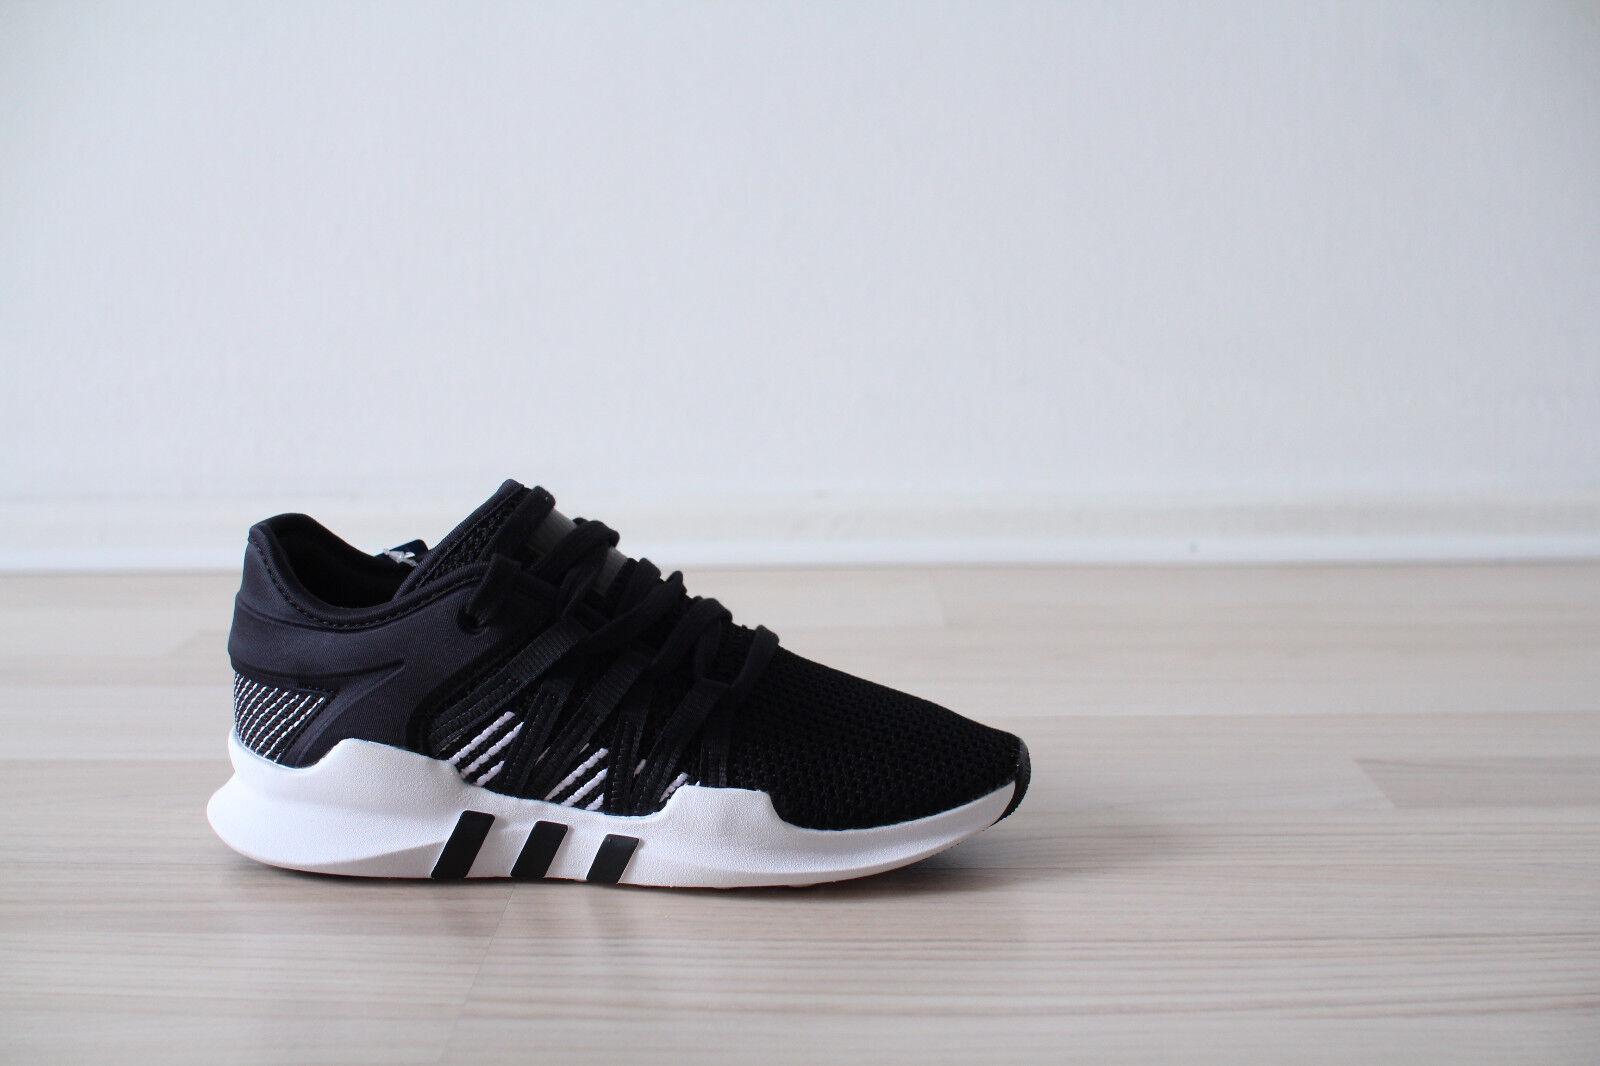 Adidas EQT Racing ADV W black white Gr. Gr. Gr. 38,39 NEU & OVP Equipment BY9795 9d721e